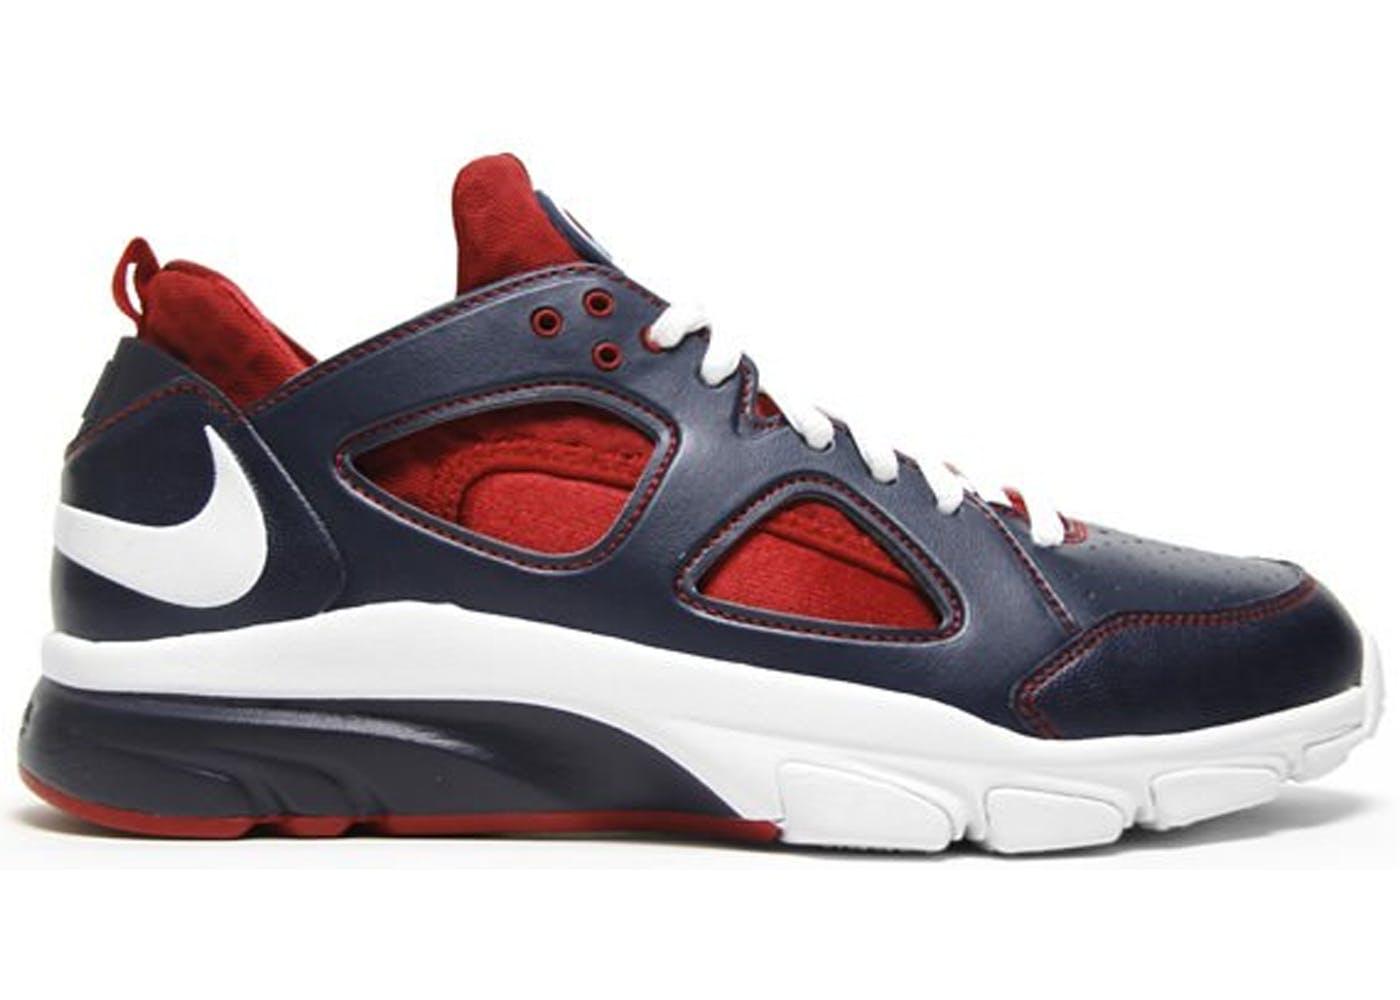 1f5f6c3b11ee Nike Zoom Huarache Trainer Low Playstation Joe Mauer Color ObsidianWhite- Varsity ...